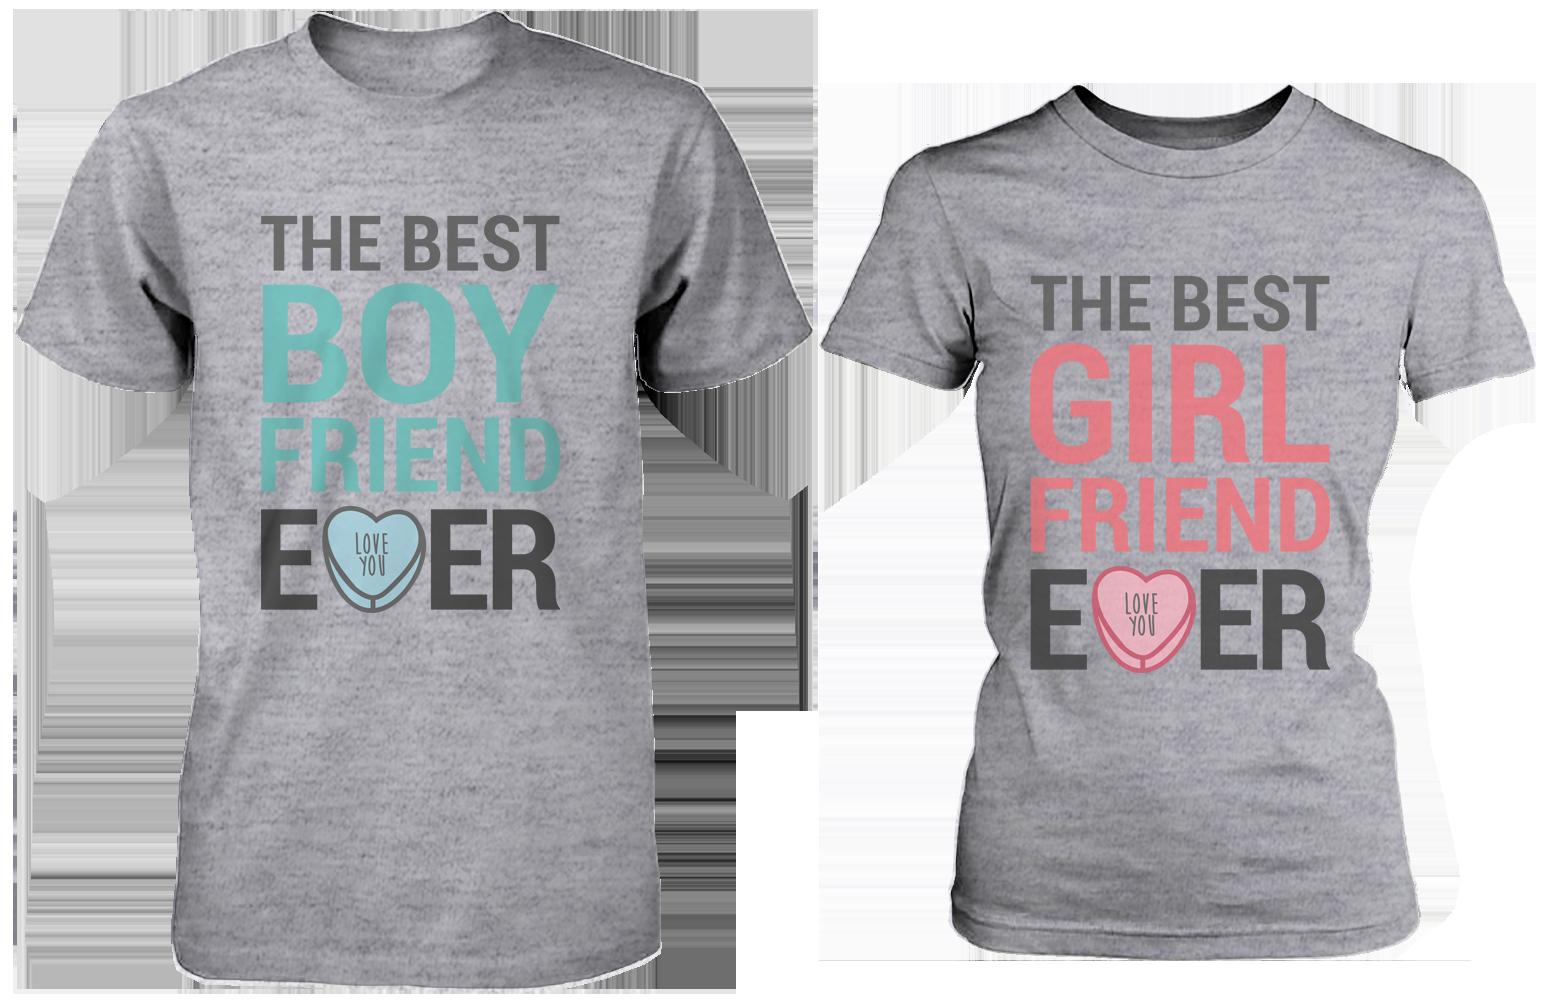 Couple t shirt design white - The Best Boyfriend Girlfriend Ever Matching Couple Shirts In Grey